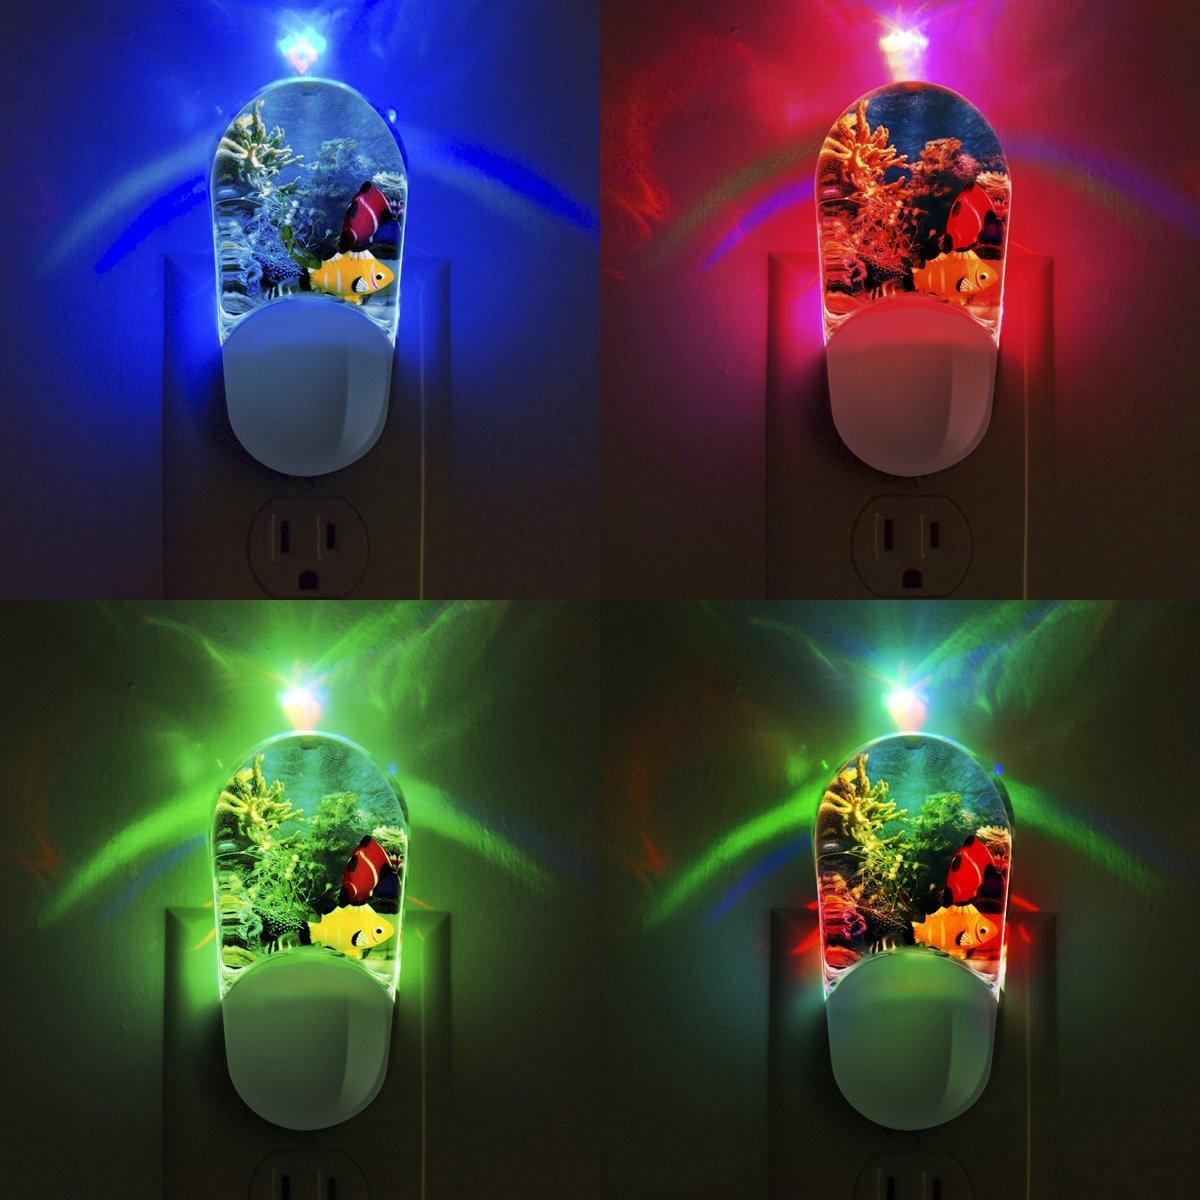 Aqualites 10908 Tropical Fish LED Night Light, Plug-In, Color ...